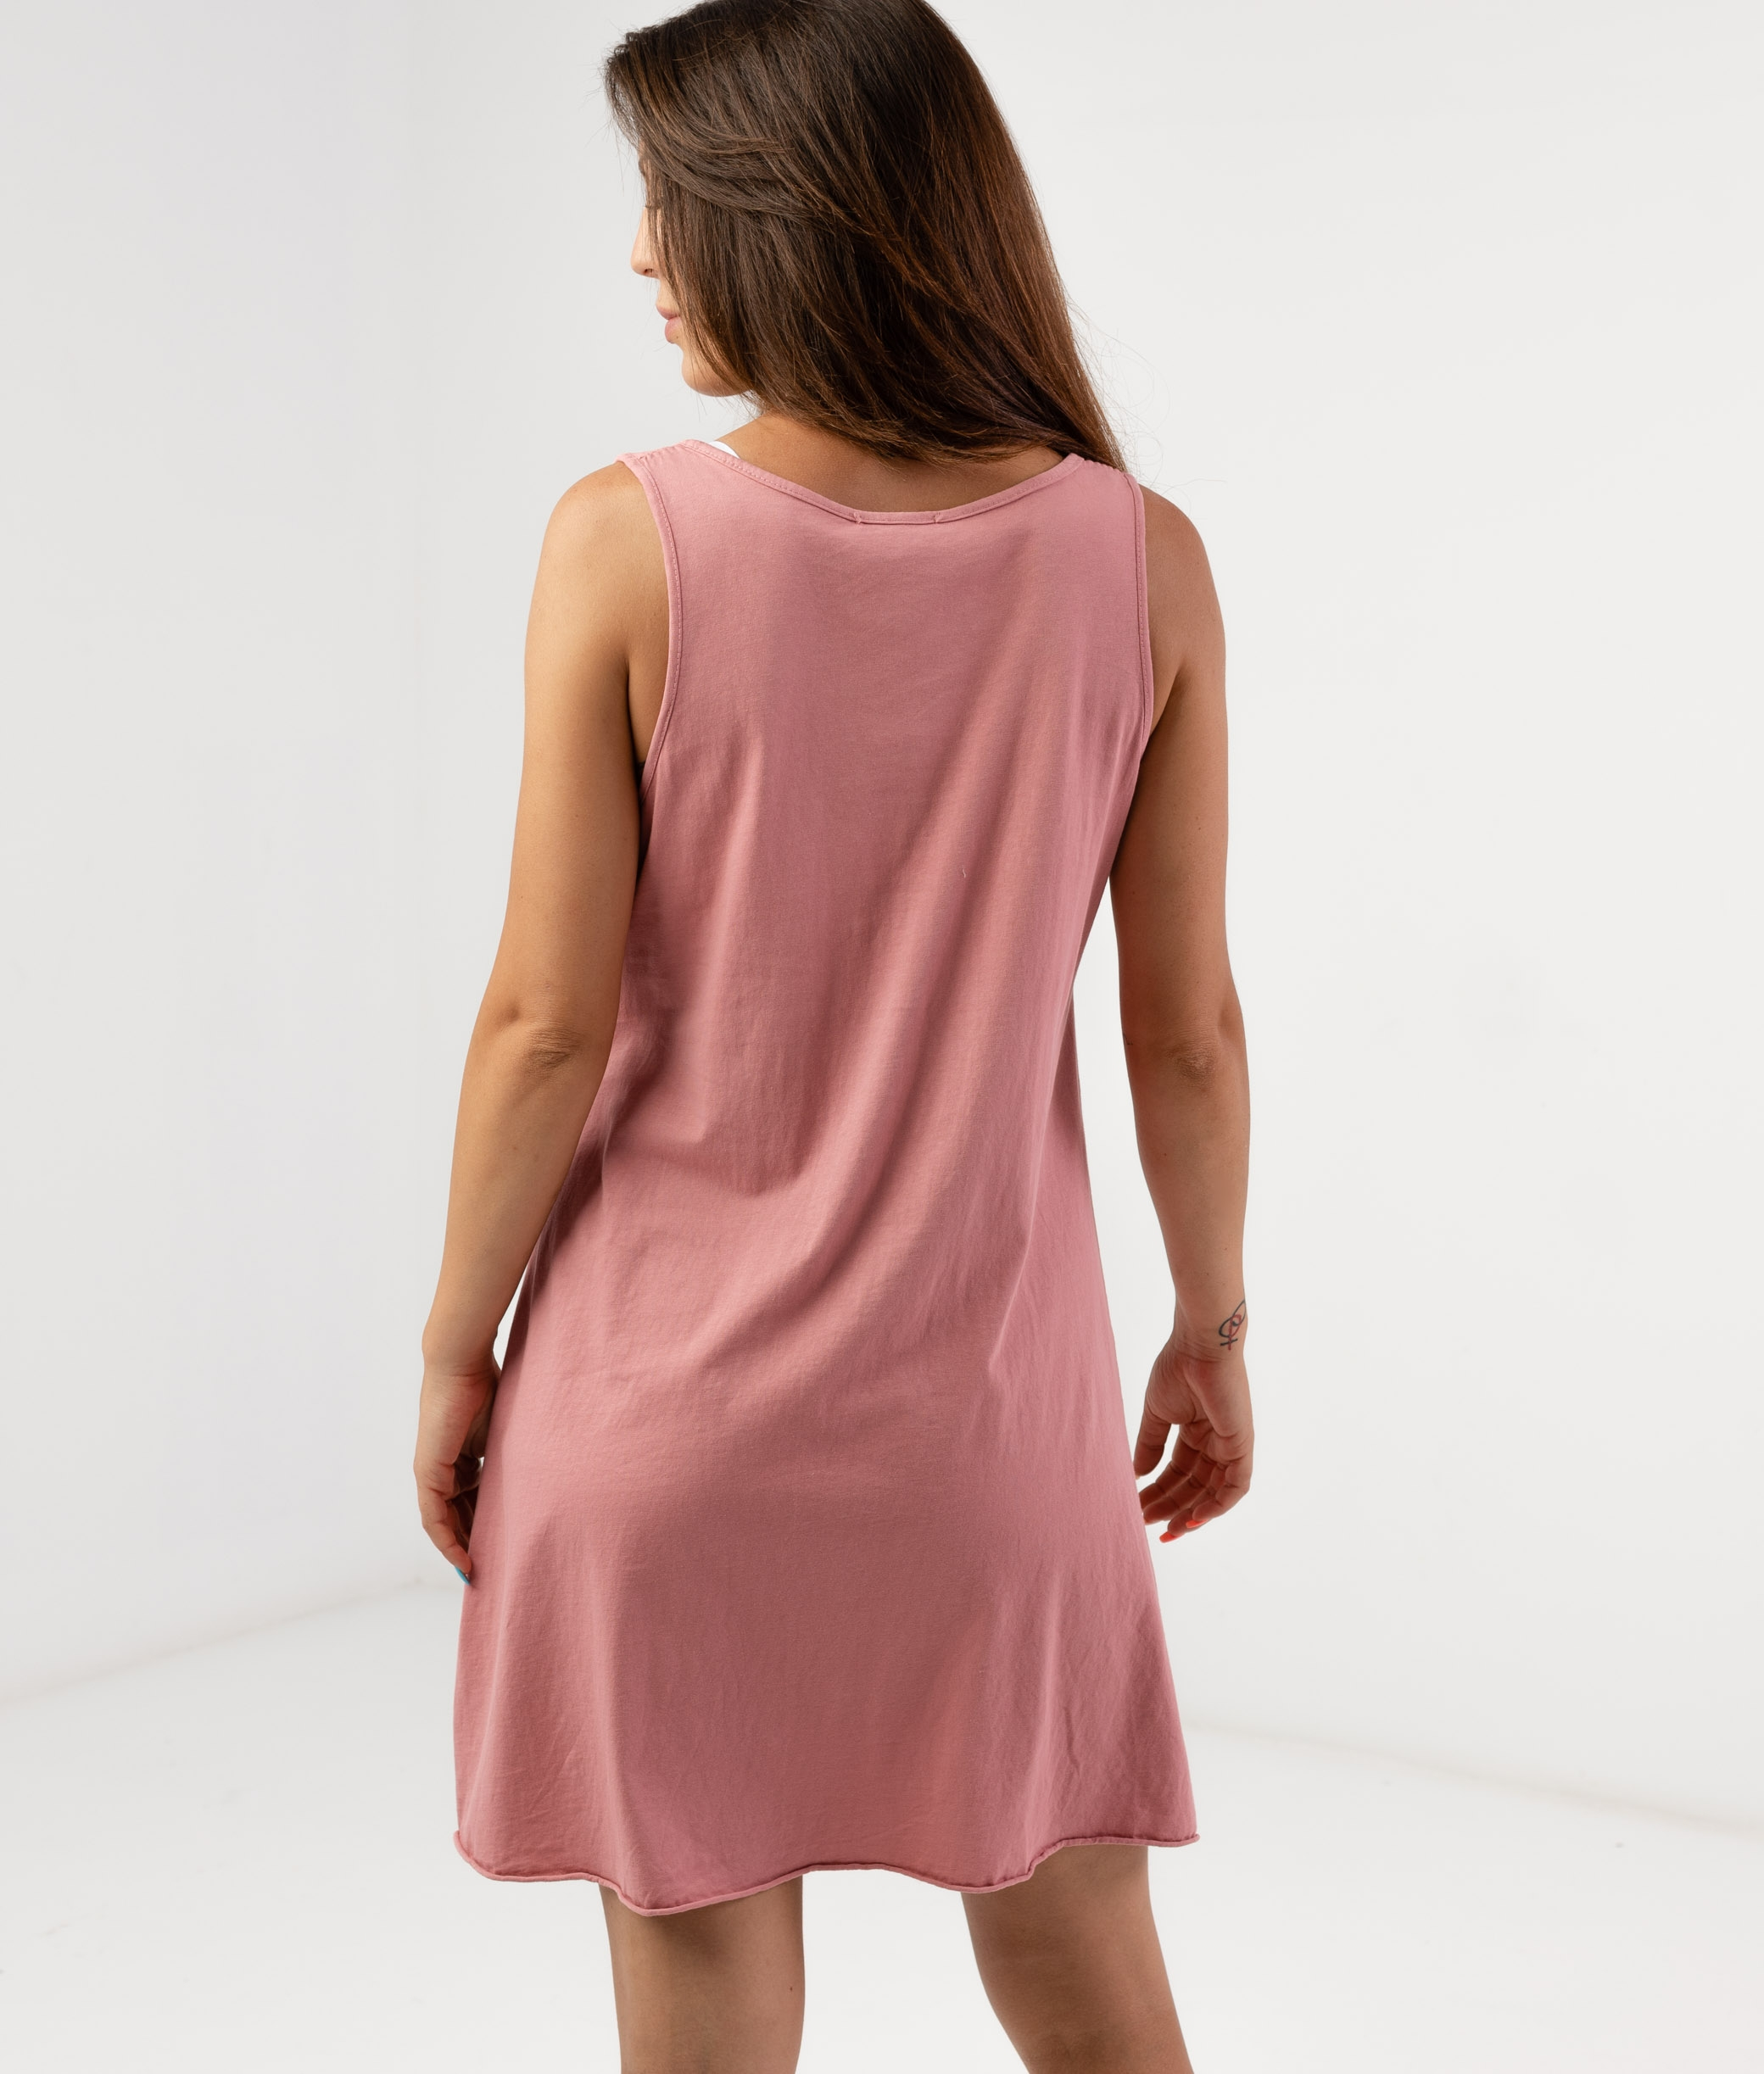 MENDRE DRESS - PINK